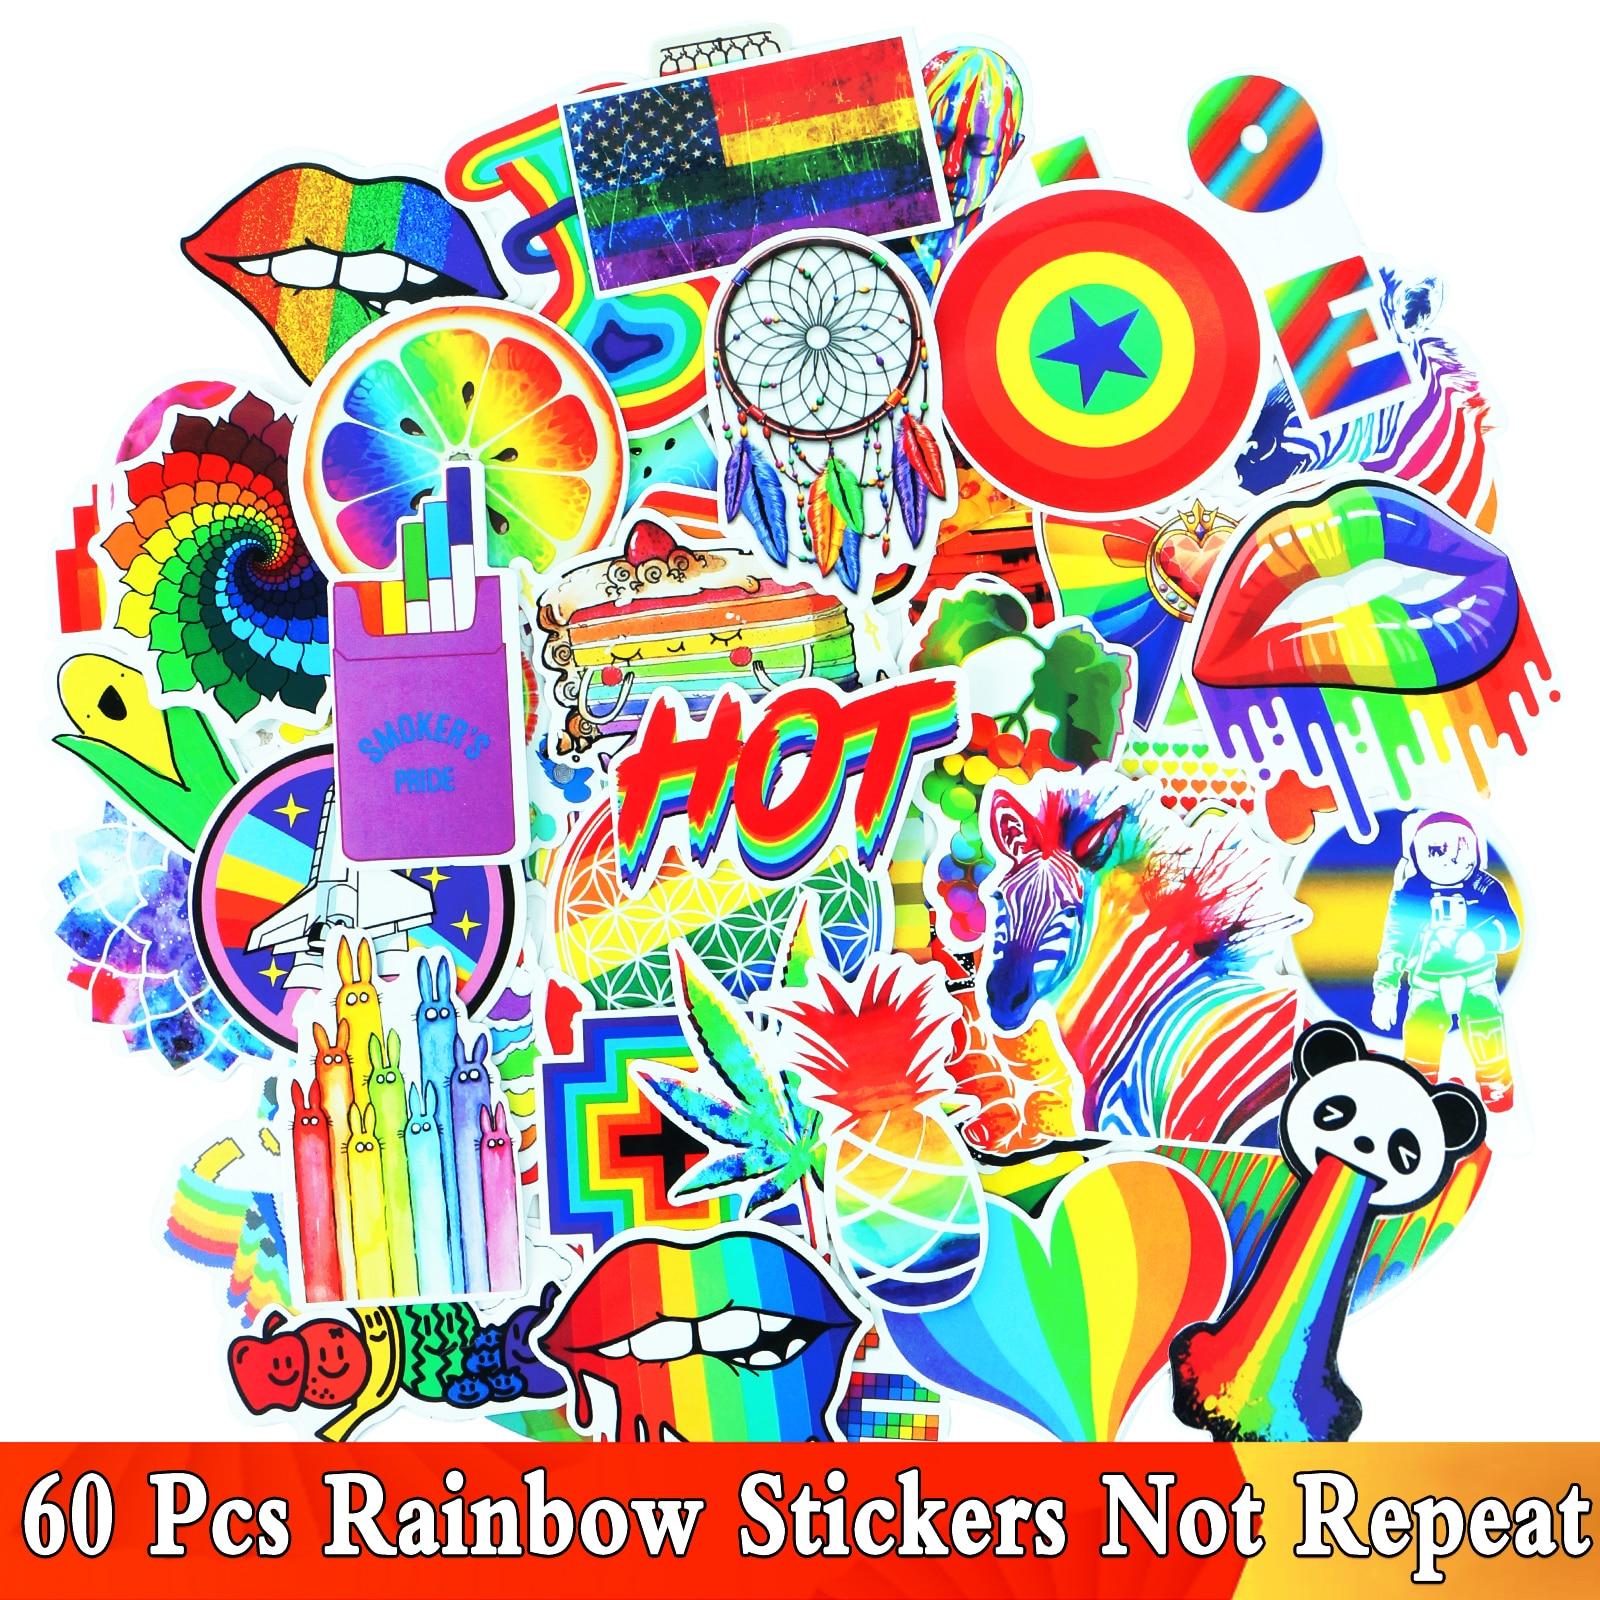 Wholesale 60 Pcs Rainbow Anime VSCO Girls Cartoon DIY Graffiti Stickers For Water Bottle Laptop Skateboard Decoration Sticker